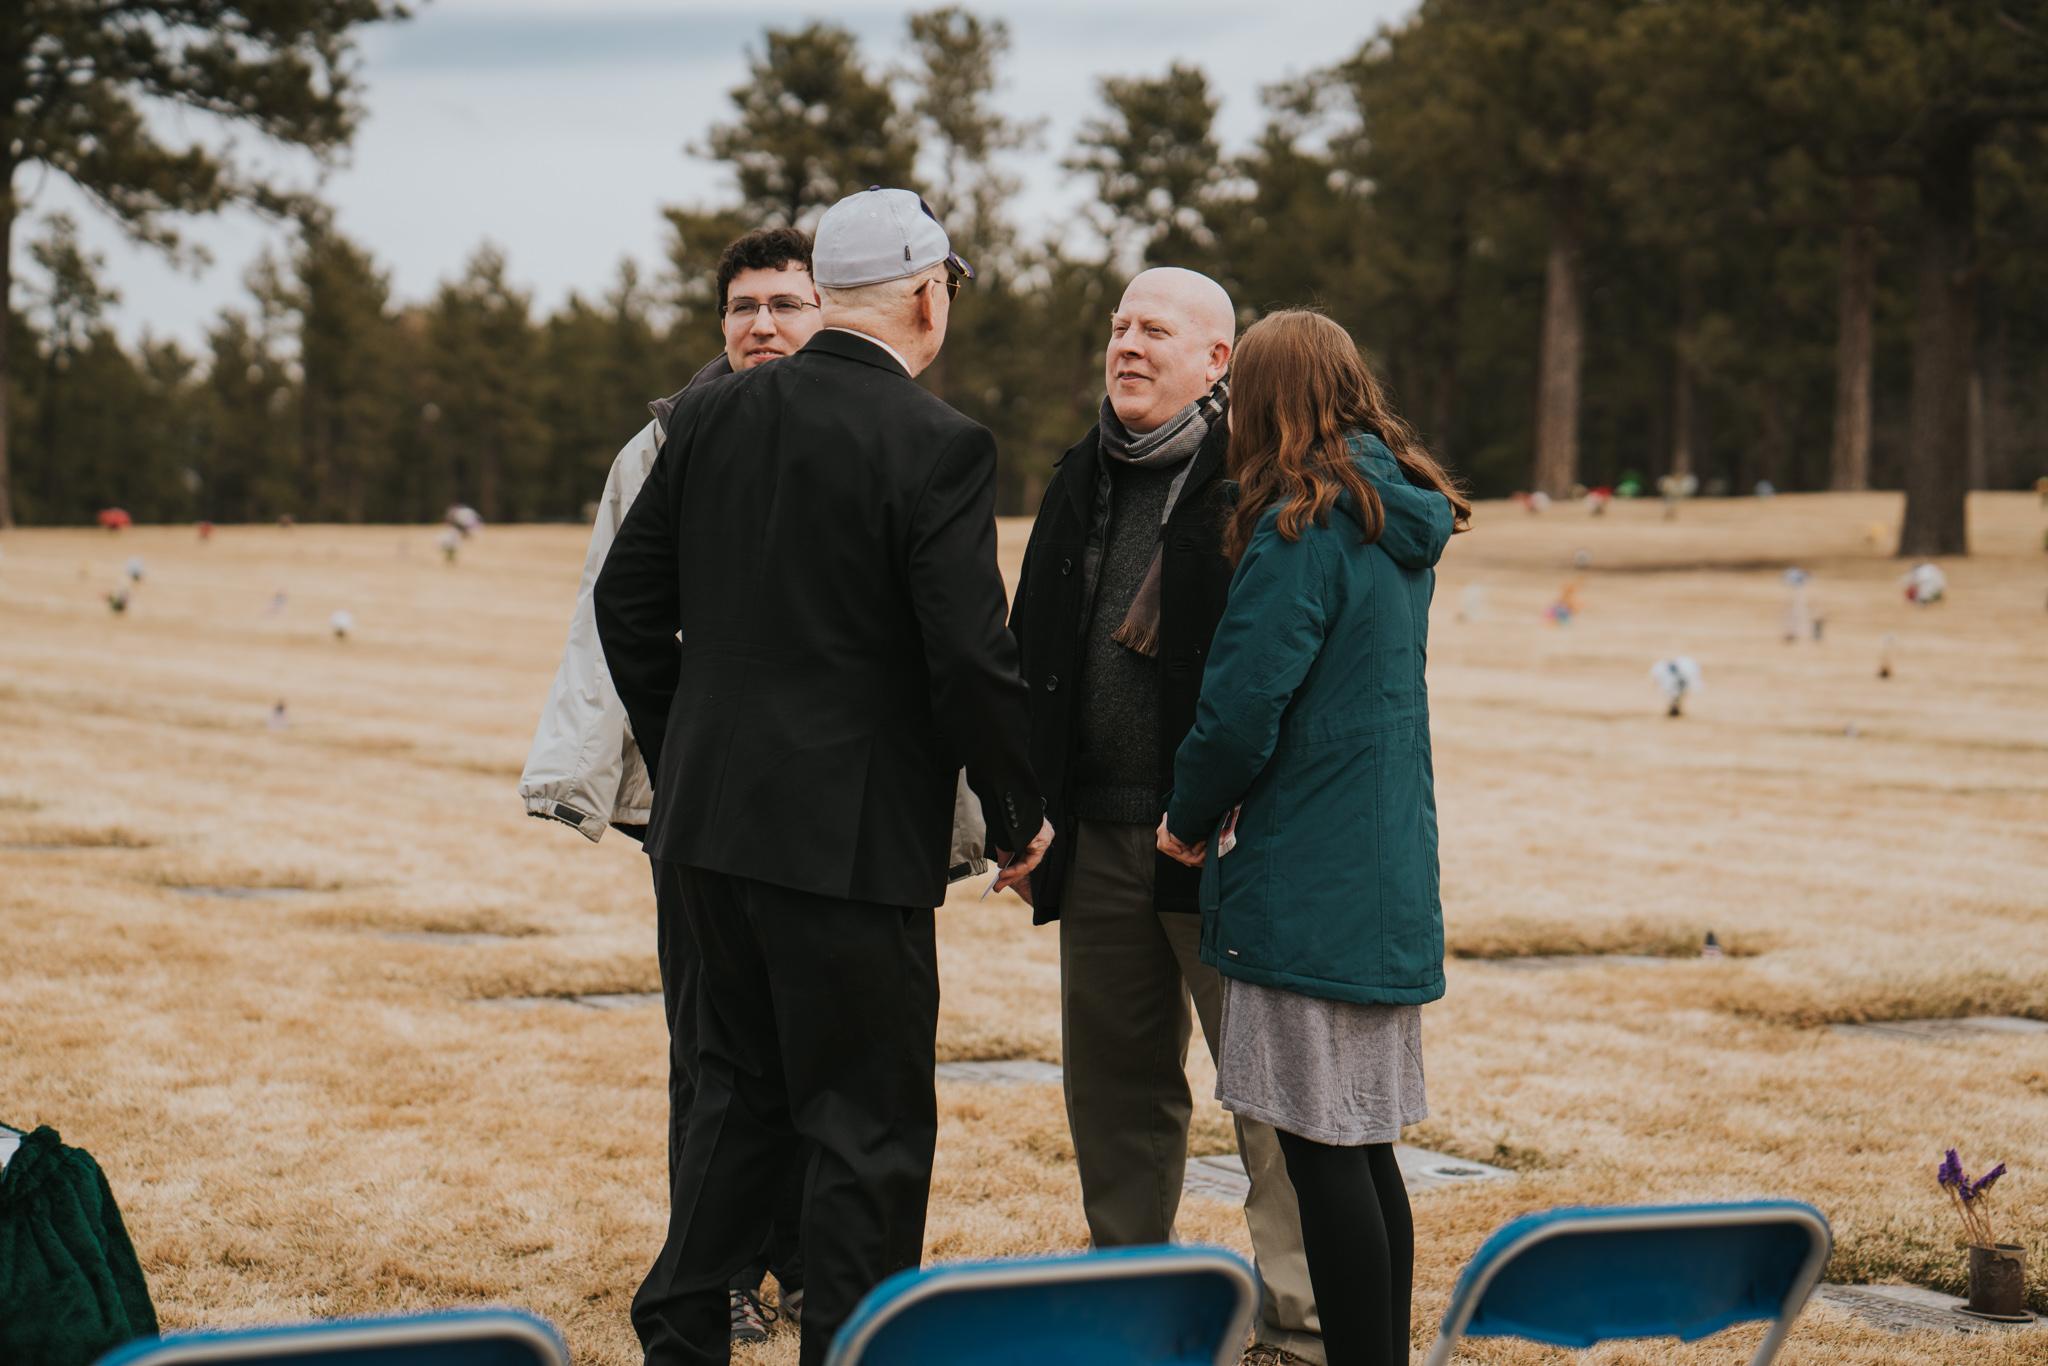 usafa-colorado-military-honours-burial-funeral-photography-grace-elizabeth-colchester-essex-alternative-wedding-lifestyle-photographer (5 of 127).jpg